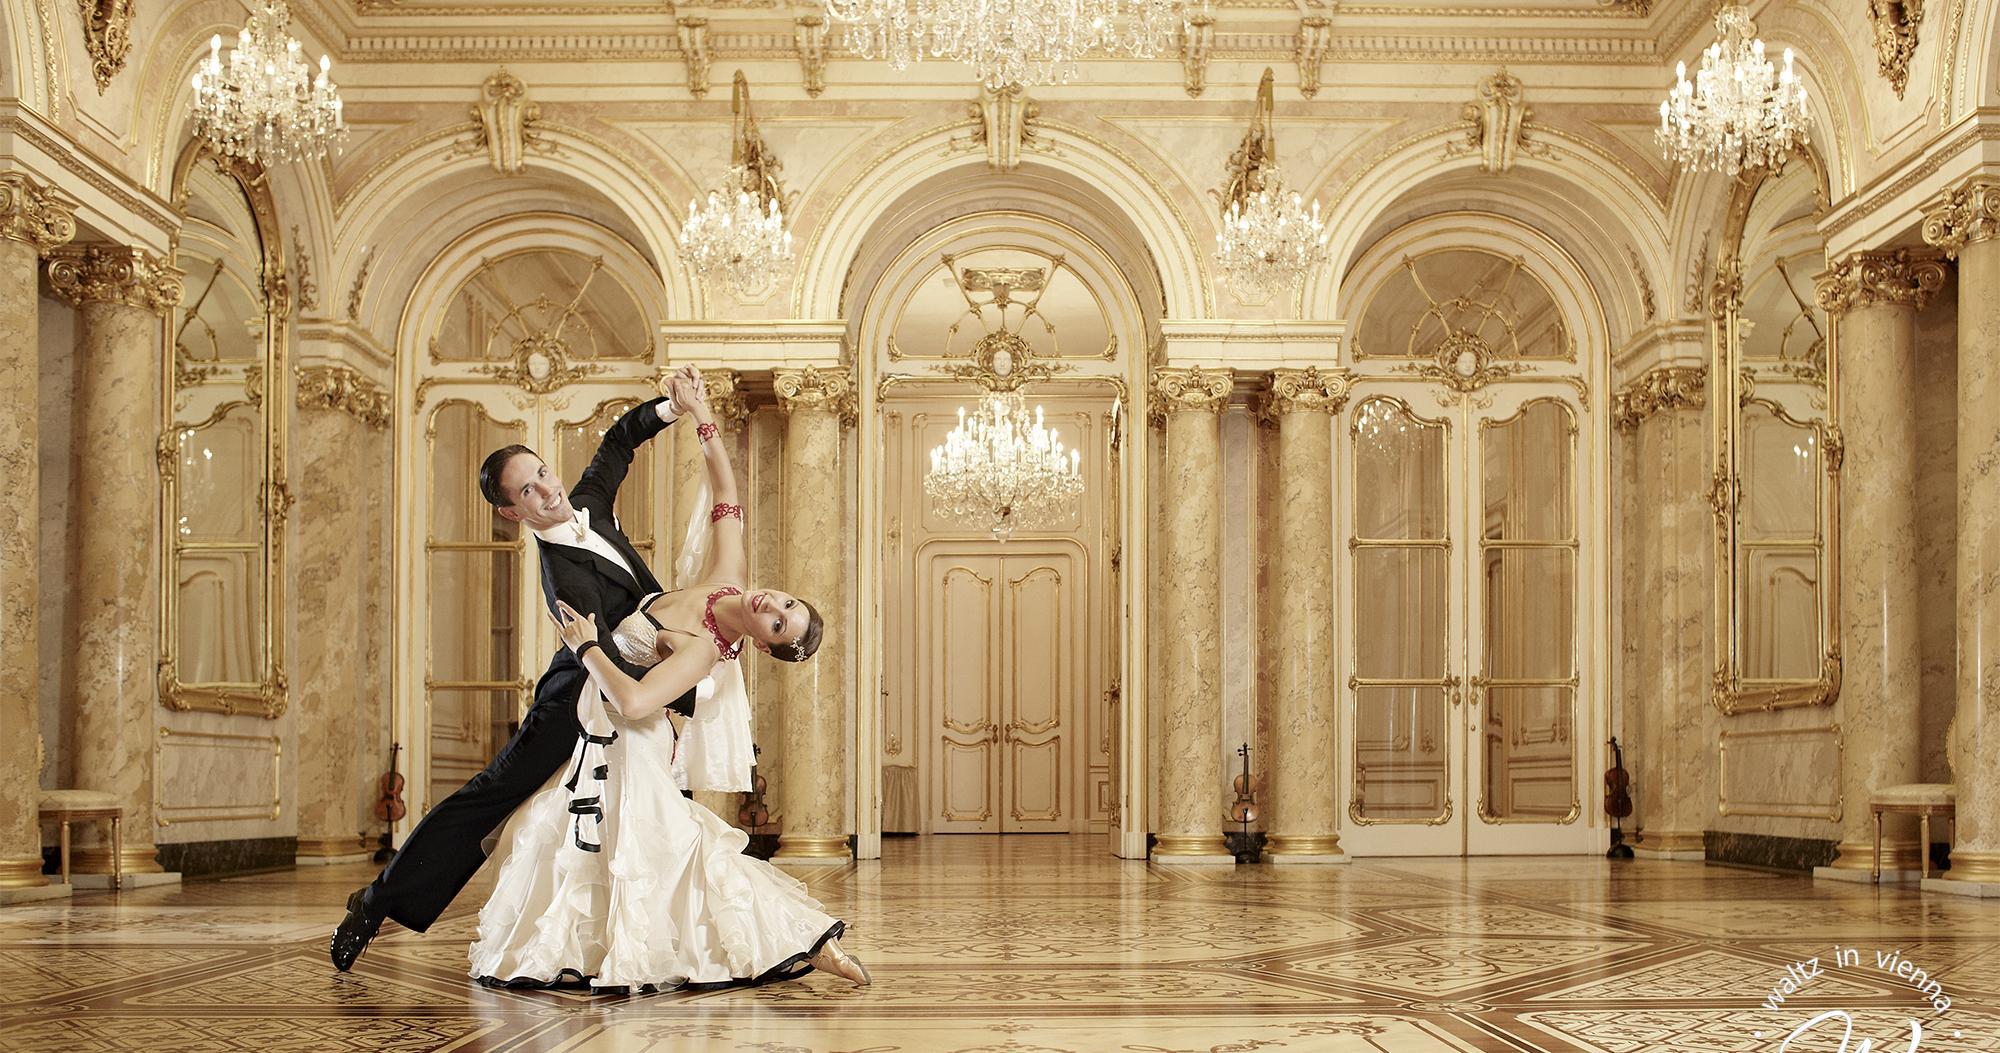 Austria 2016 Autumn Travel Inspiration LocalBini BiniBlog Ballroom Dancing Vienna Waltz European Destinations Europe Travel Destination Europe